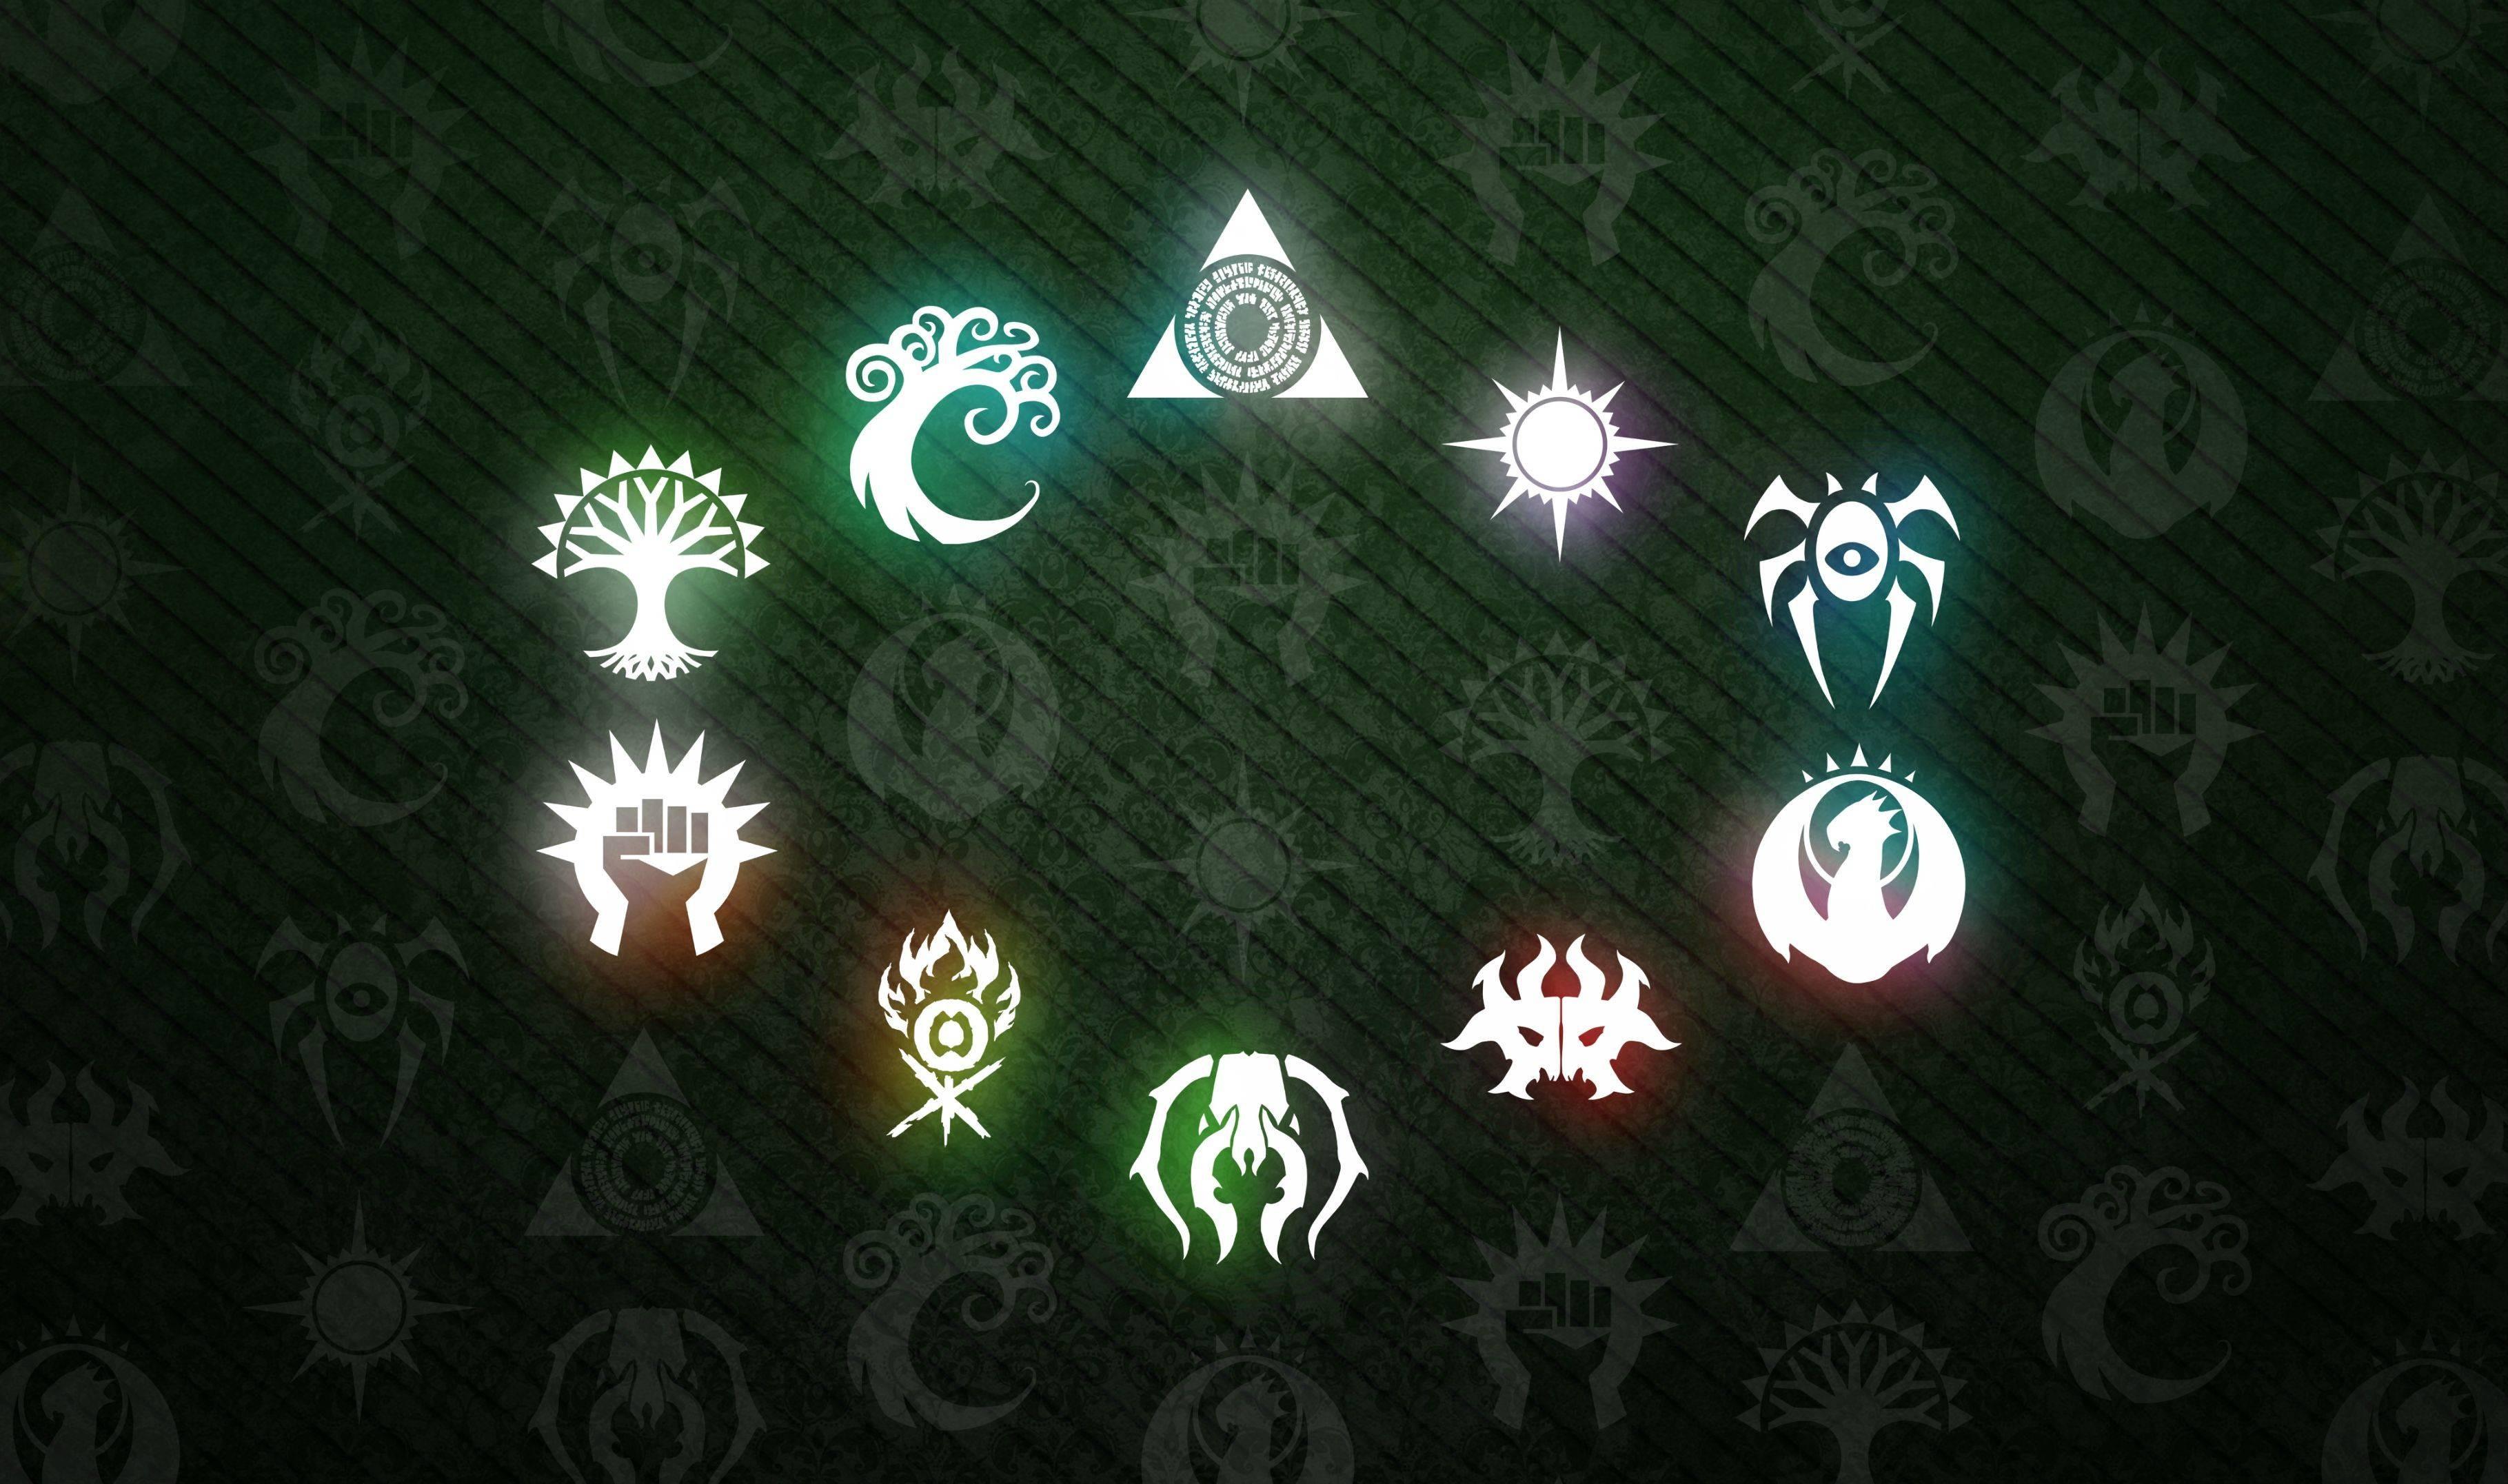 General 3638x2153 symbols trees fire dragon skull Magic: The Gathering Boros Izzet